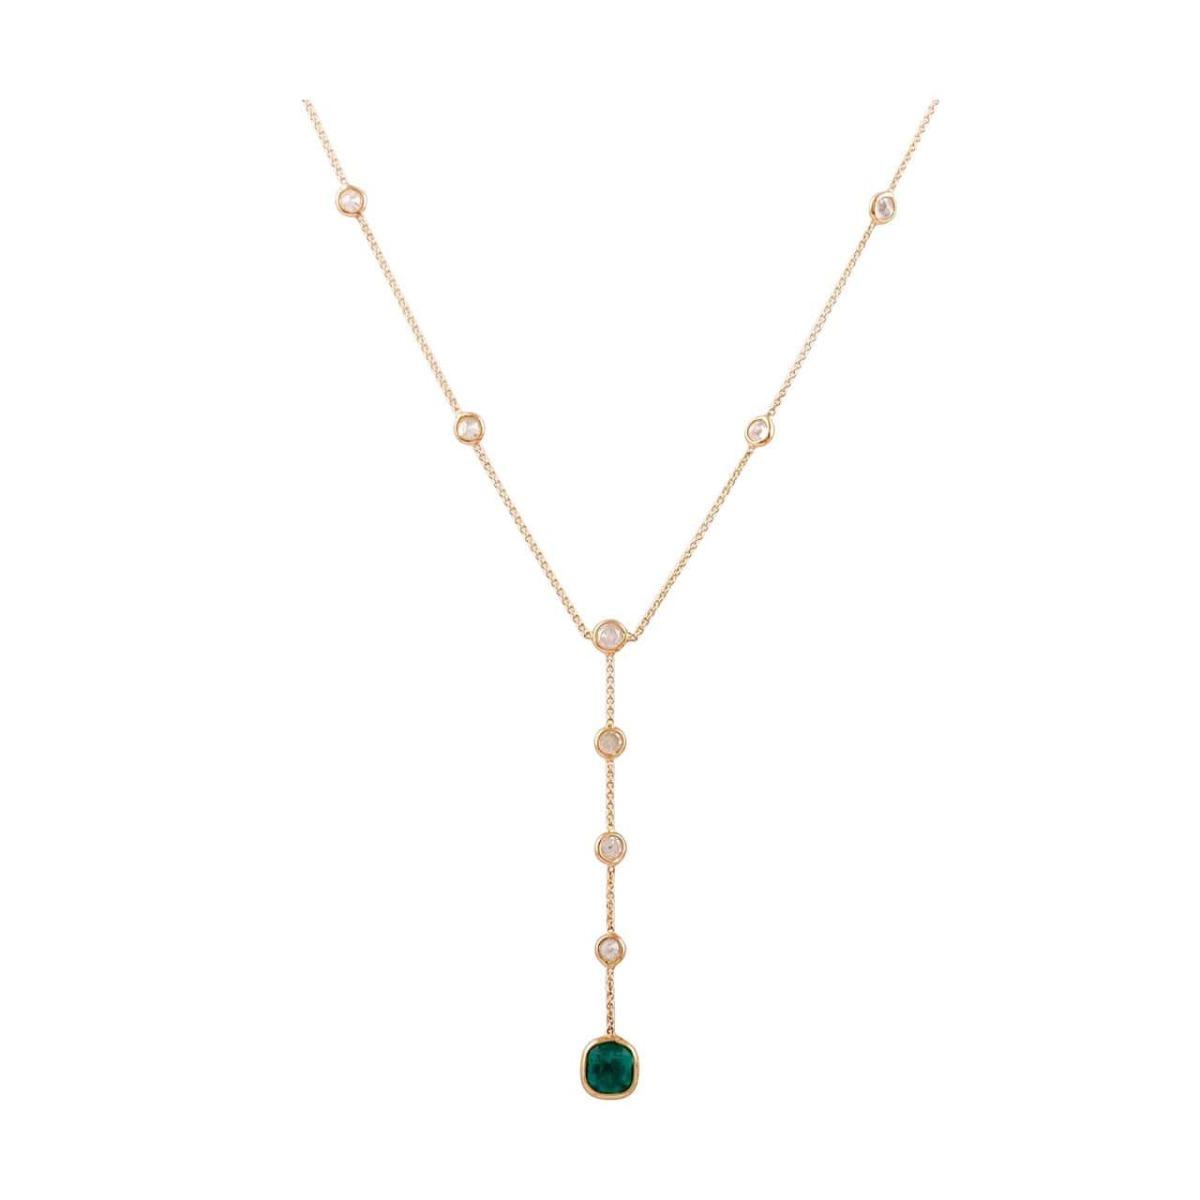 18kt Yellow Gold Emerald & Diamond Necklace